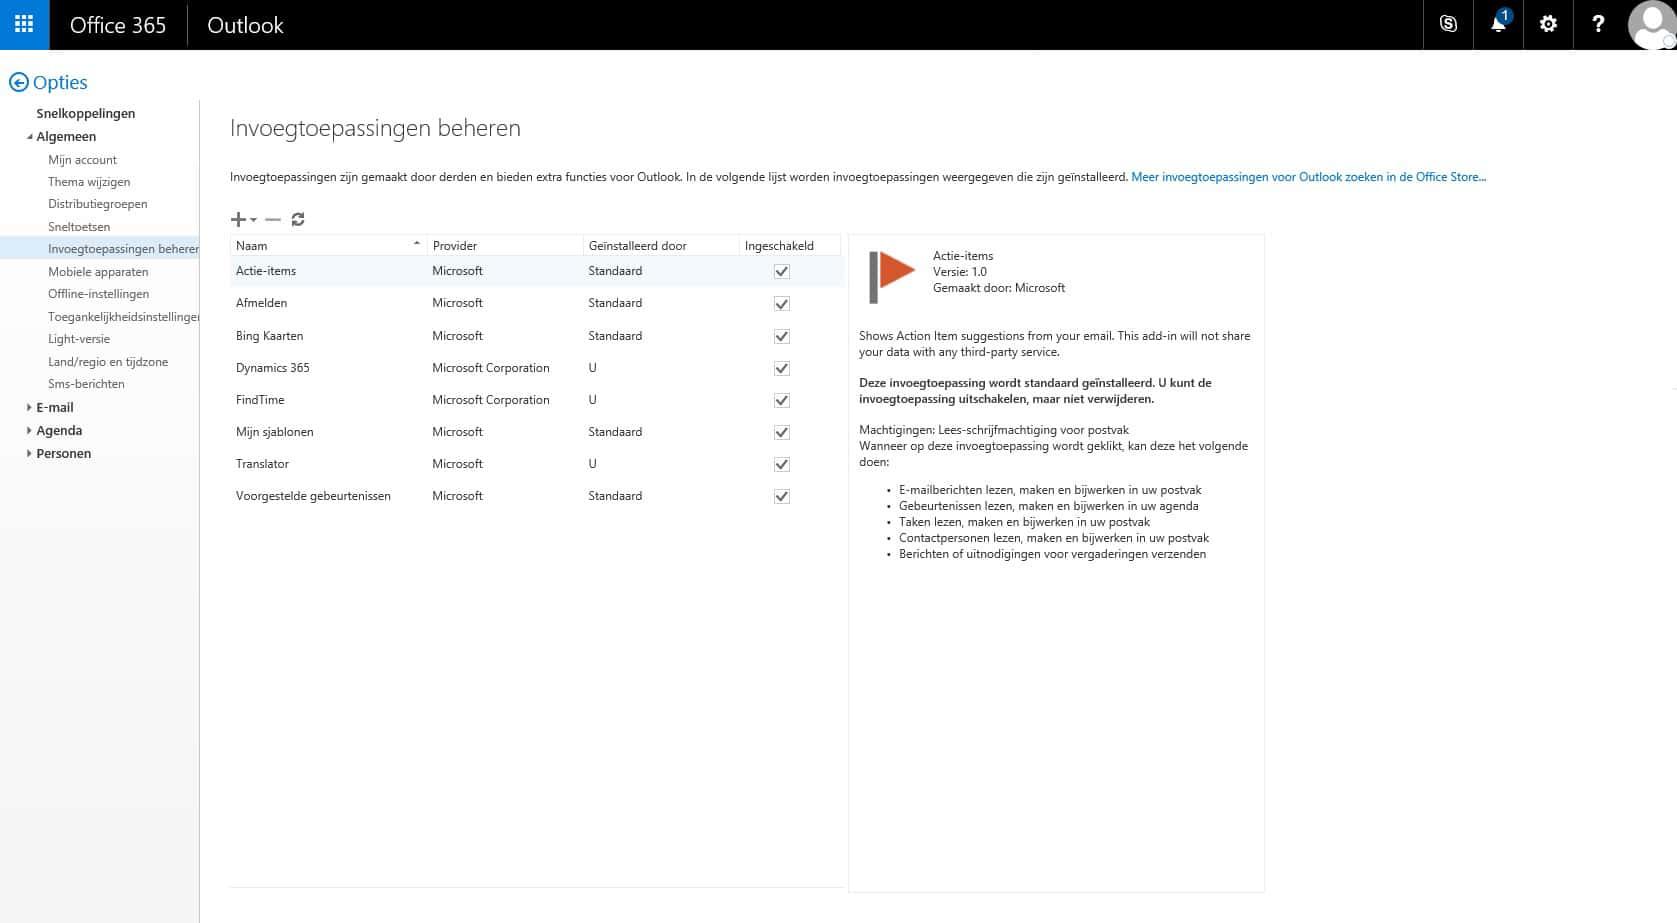 Translator for Outlook - Invoegtoepassingen beheren